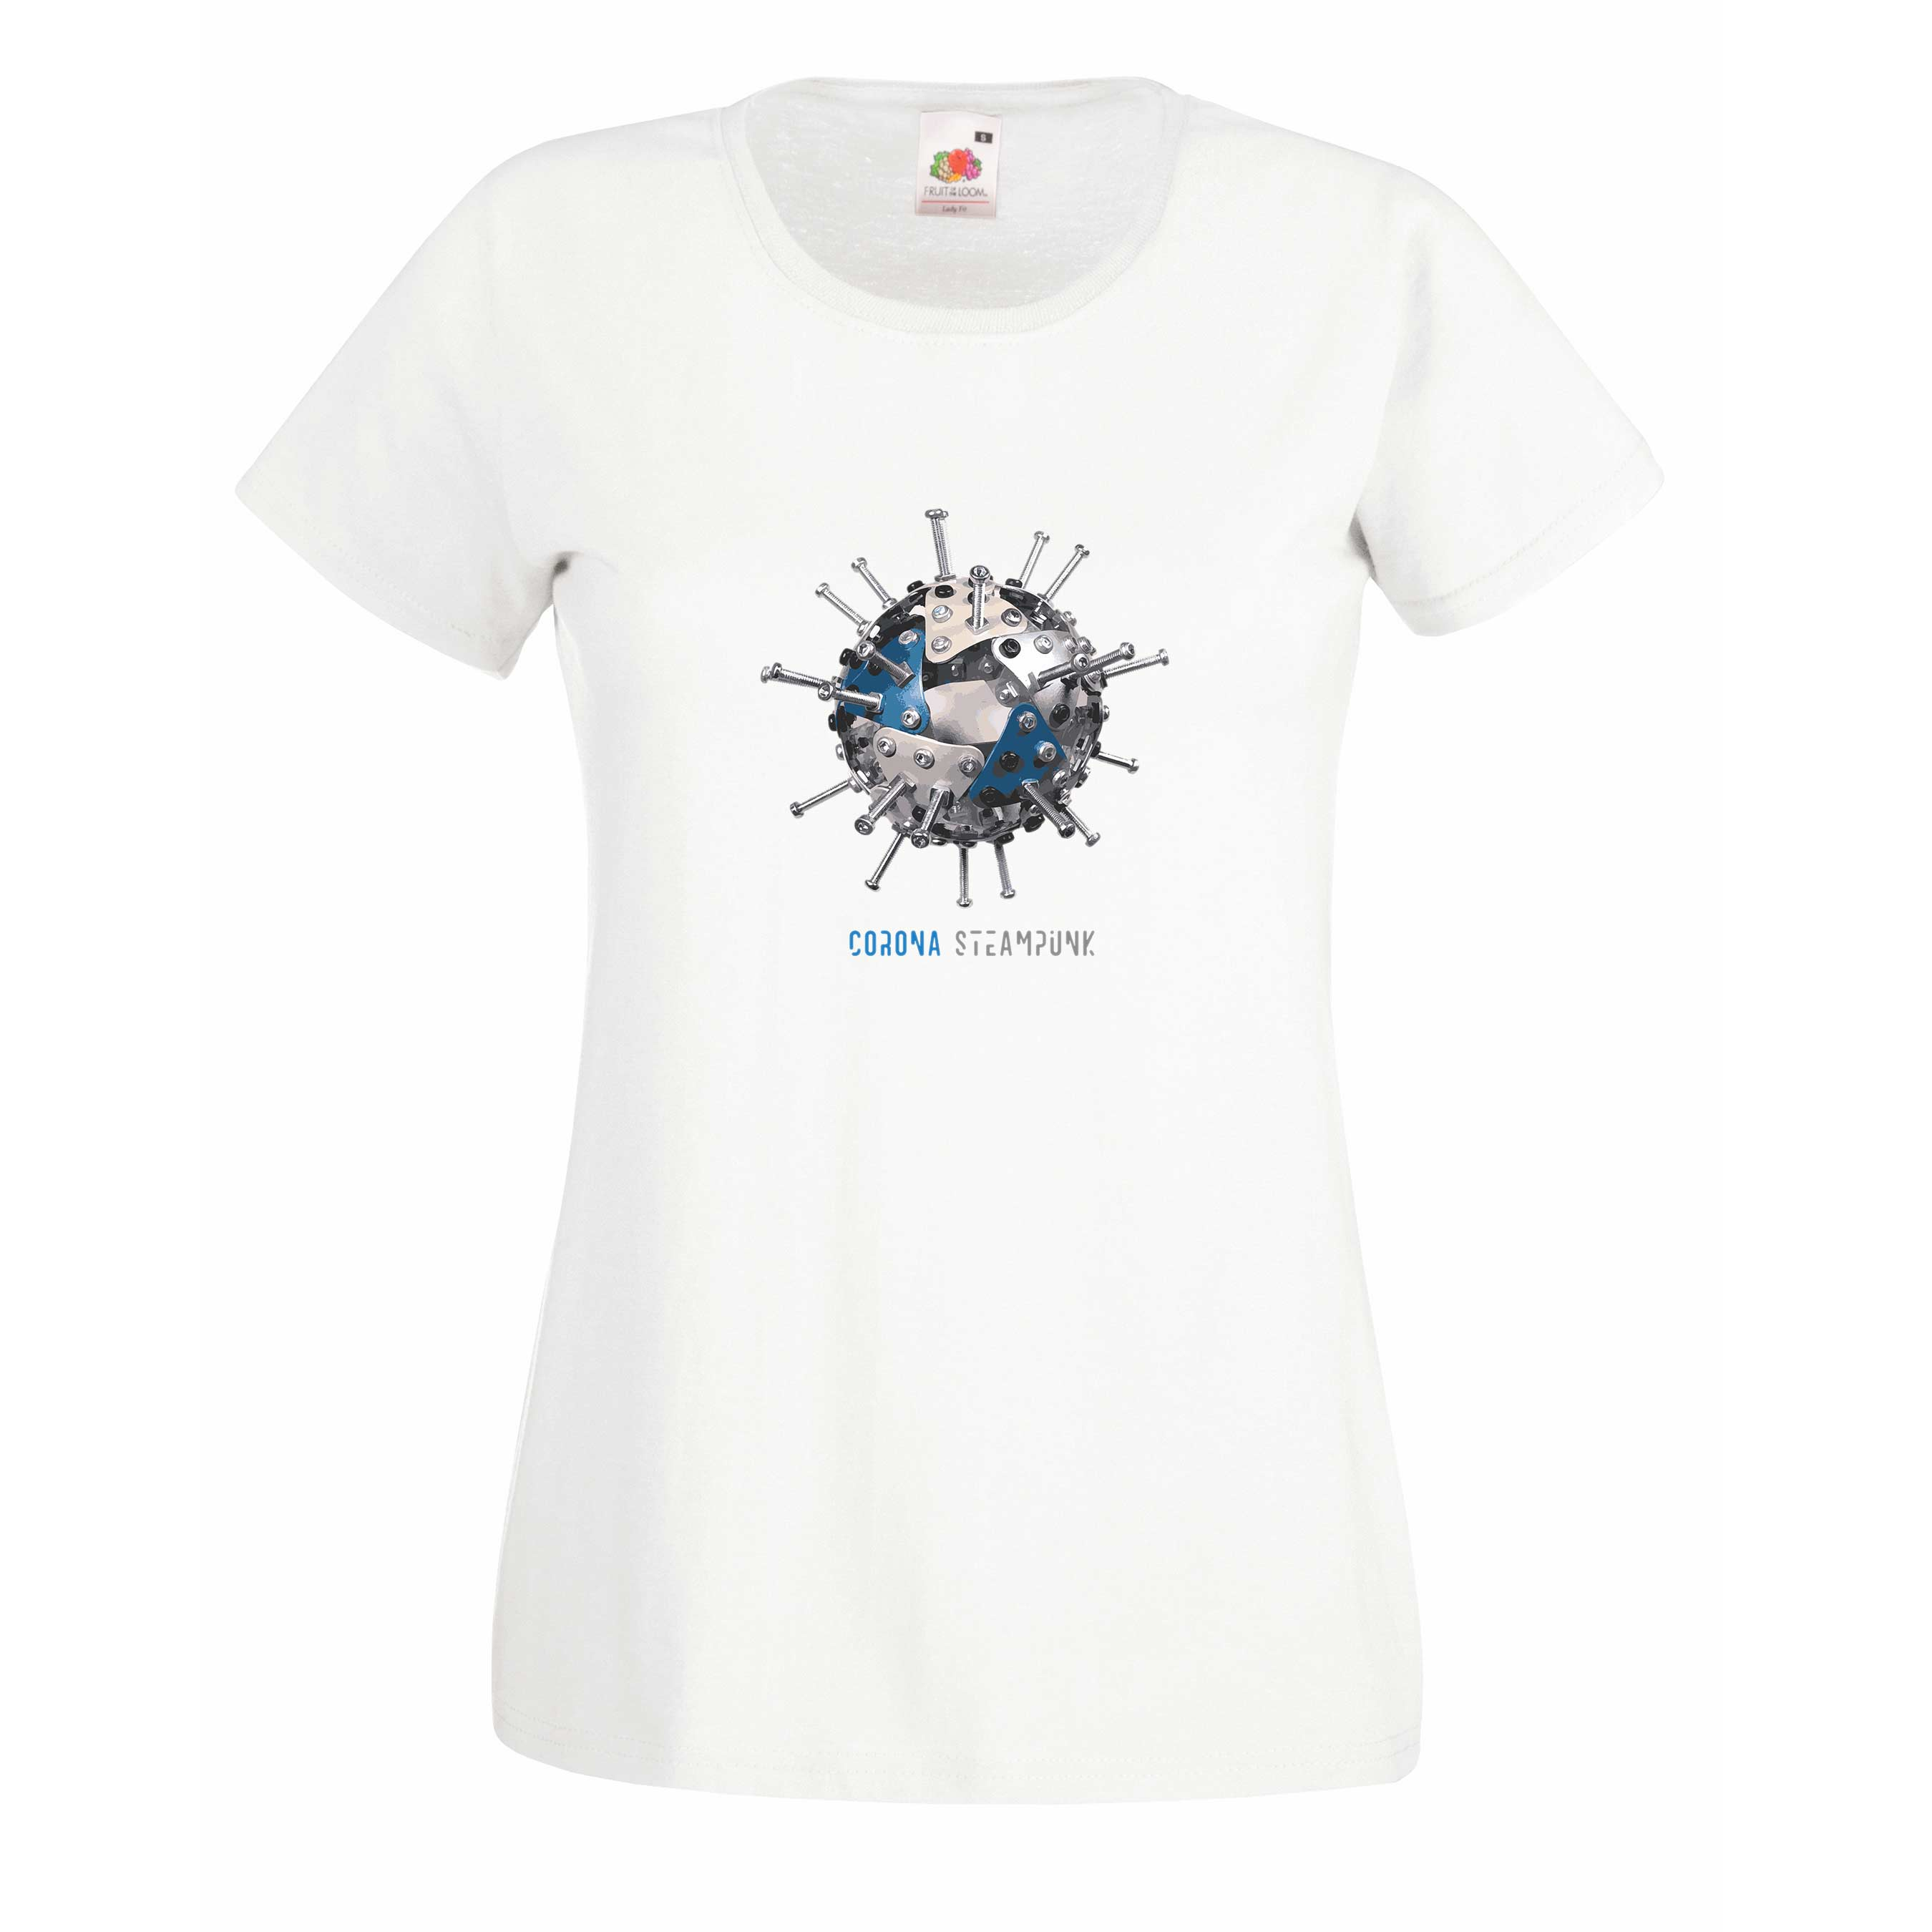 Corona steampunk design for t-shirt, hoodie & sweatshirt